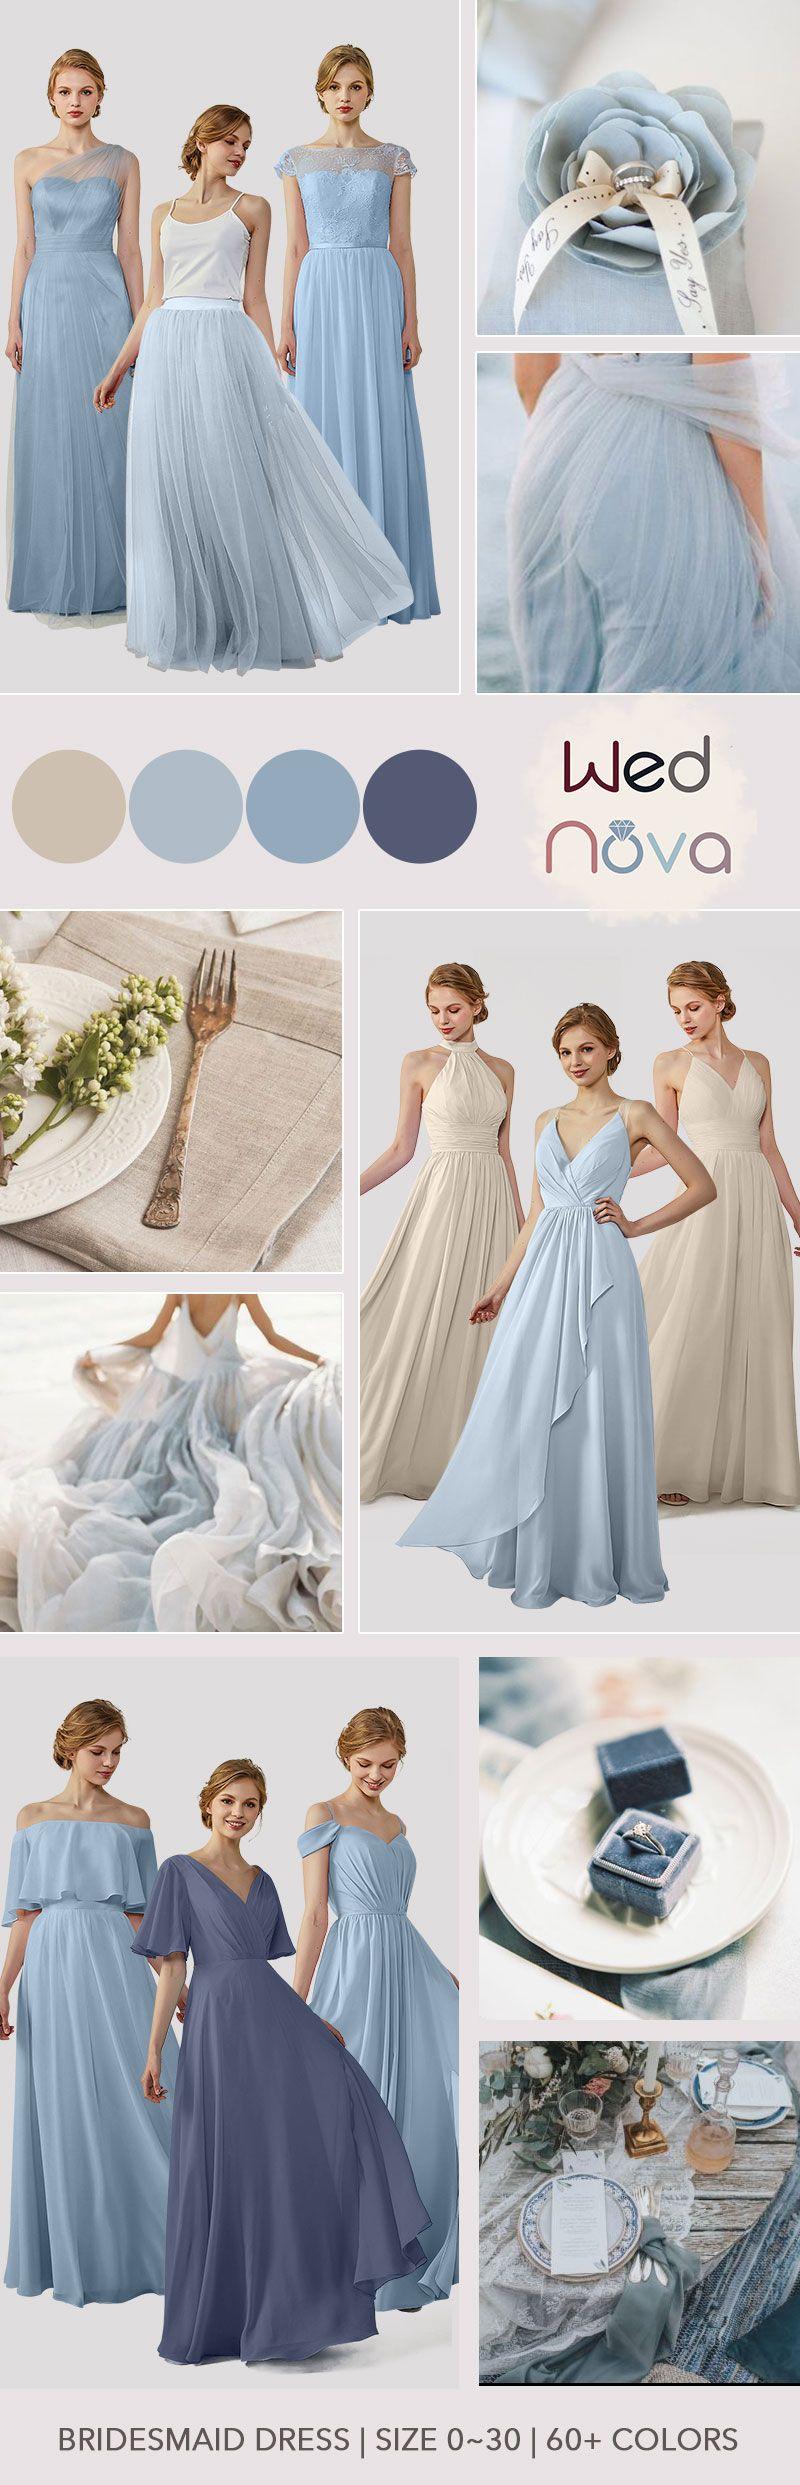 Boho wedding dress gray u dusty blue beautiful dress for wedding